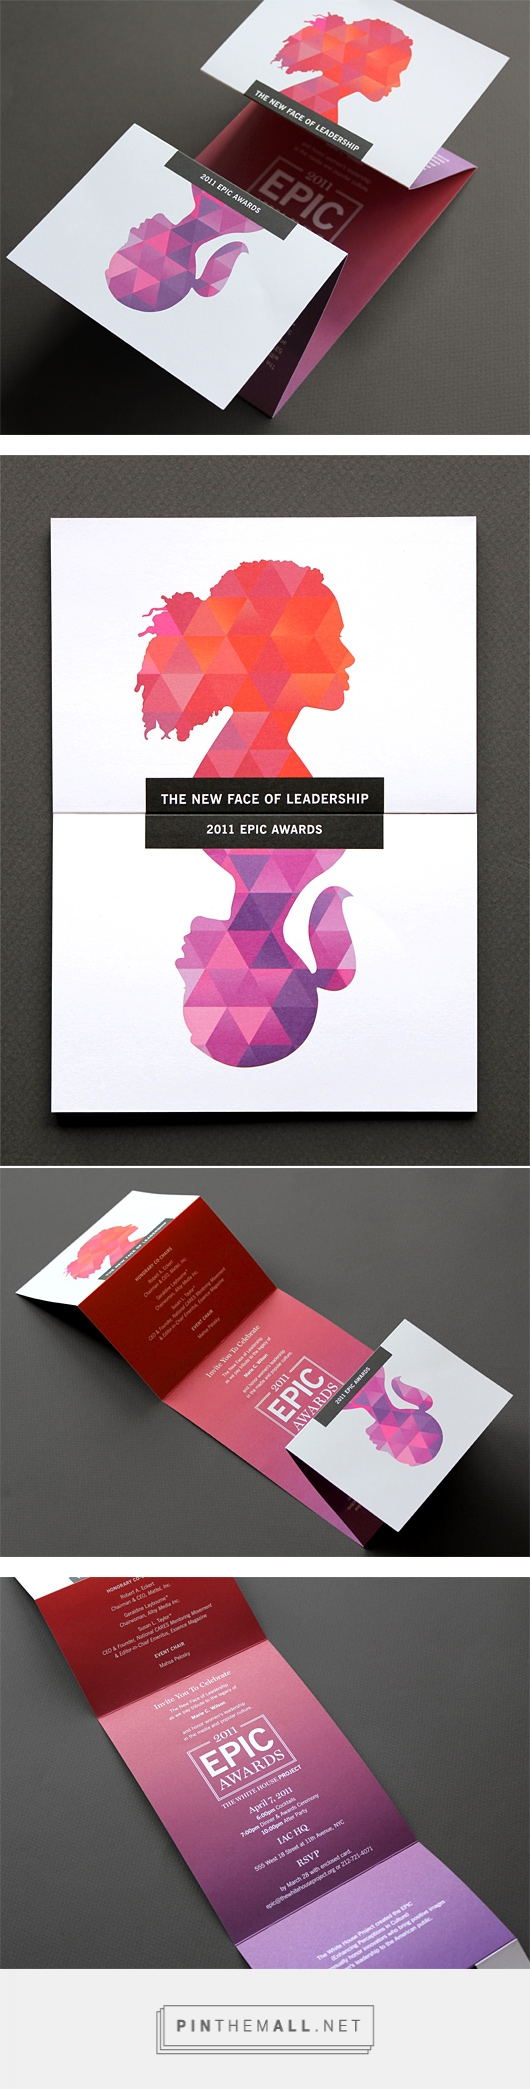 Print • 2011 EPIC Awards   Papeterie   Pinterest   Flyer und Mappen